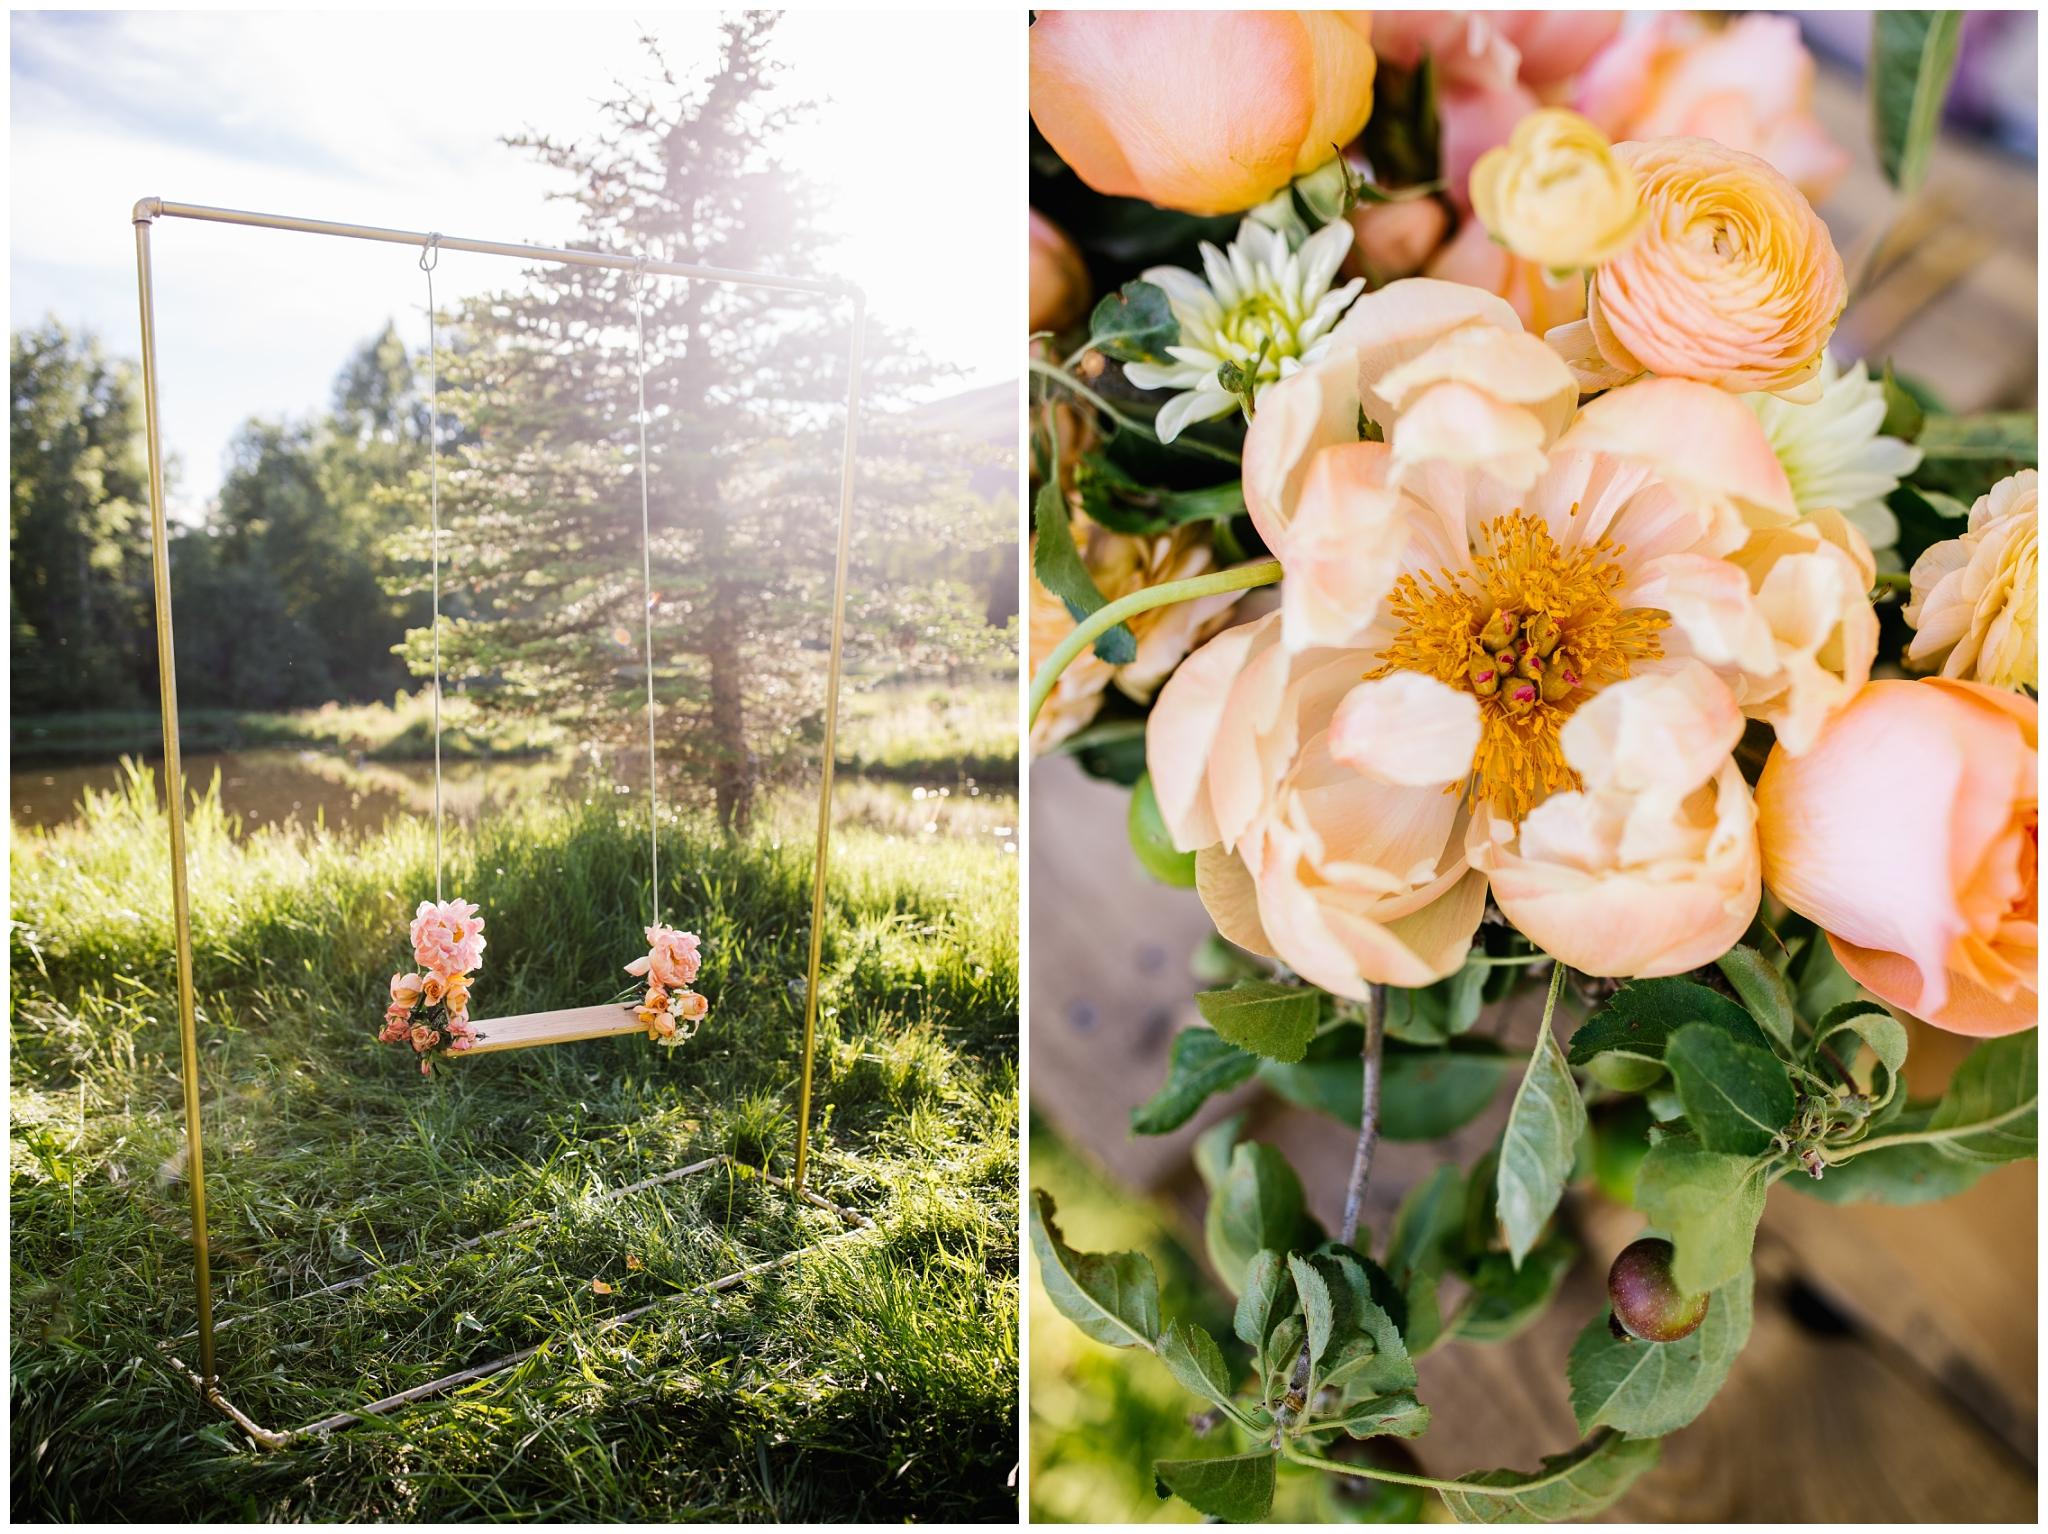 Lizzie-B-Imagery-Utah-Wedding-Photographer-Park-City-Photographer_0024.jpg